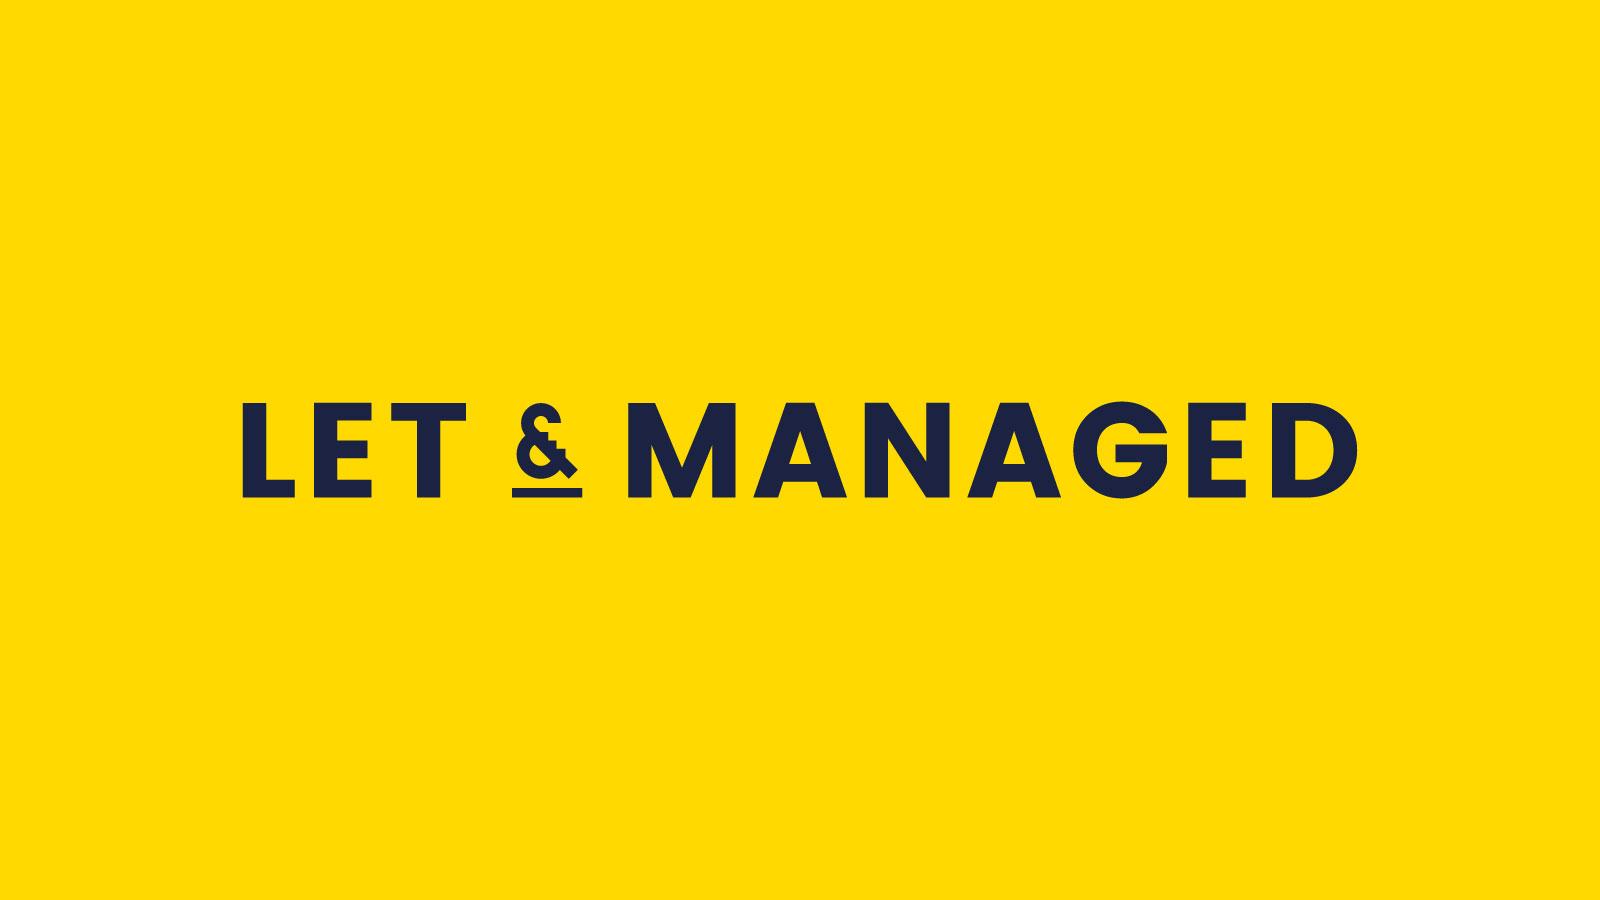 Let & managed graphic design.